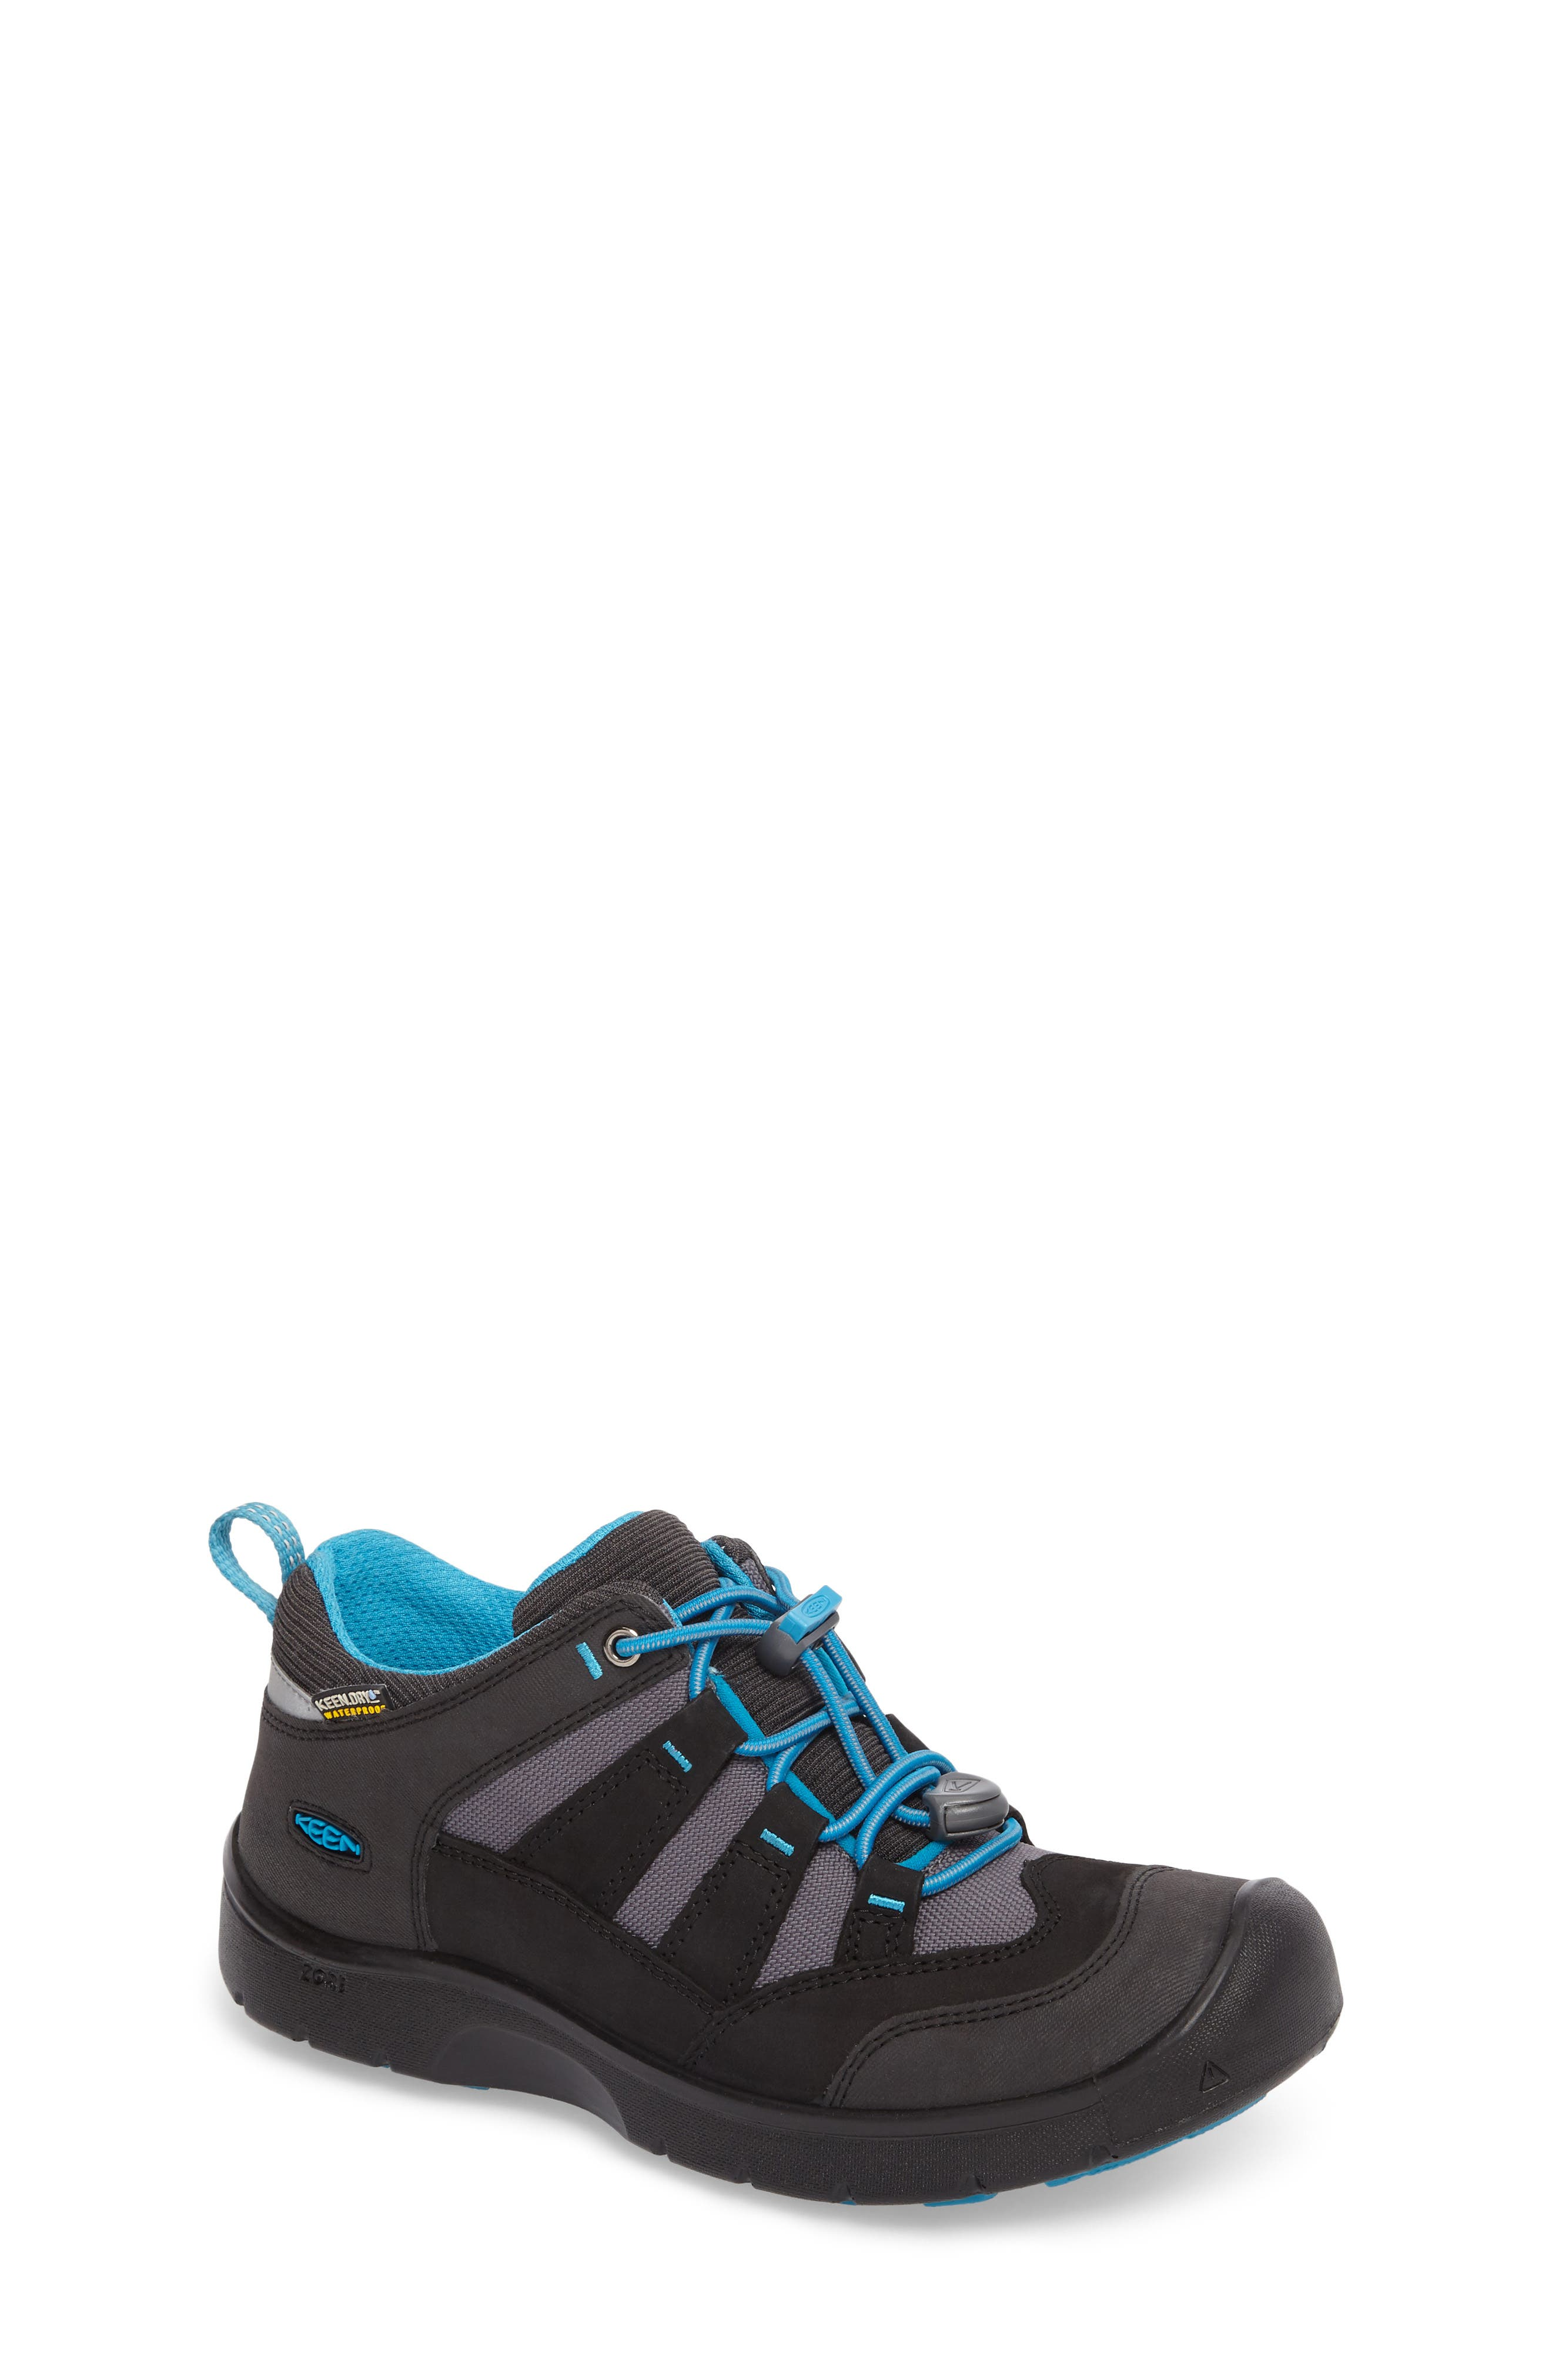 Keen Hikeport Waterproof Sneaker (Toddler, Little Kid & Big Kid)